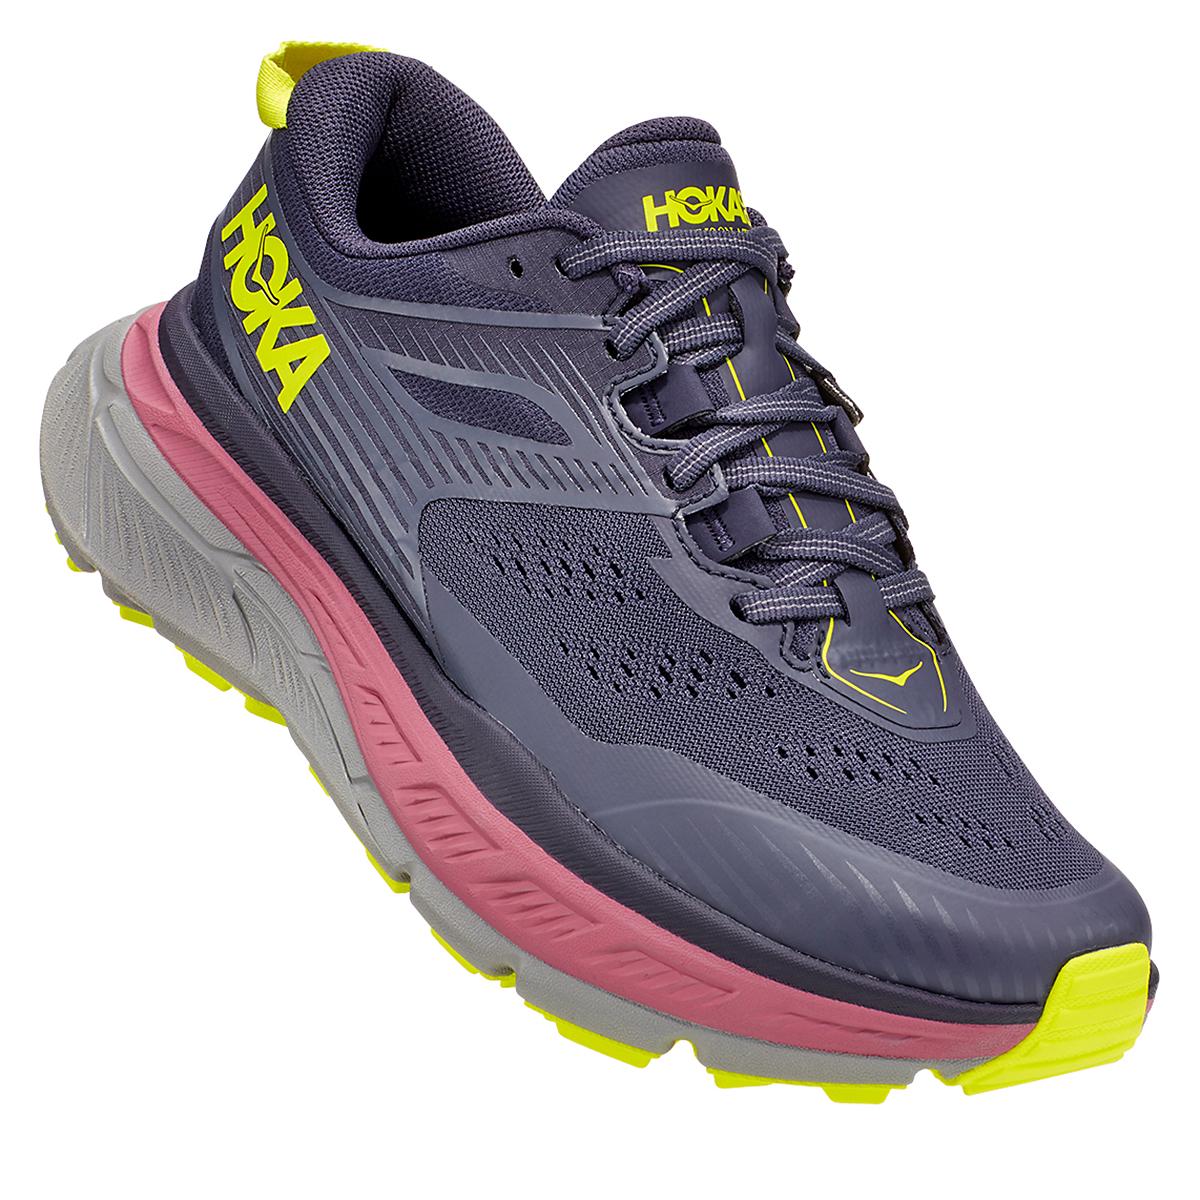 Women's Hoka One One Stinson Atr 6 Trail Running Shoe - Color: Deep Well/Evening Primrose - Size: 5 - Width: Regular, Deep Well/Evening Primrose, large, image 4